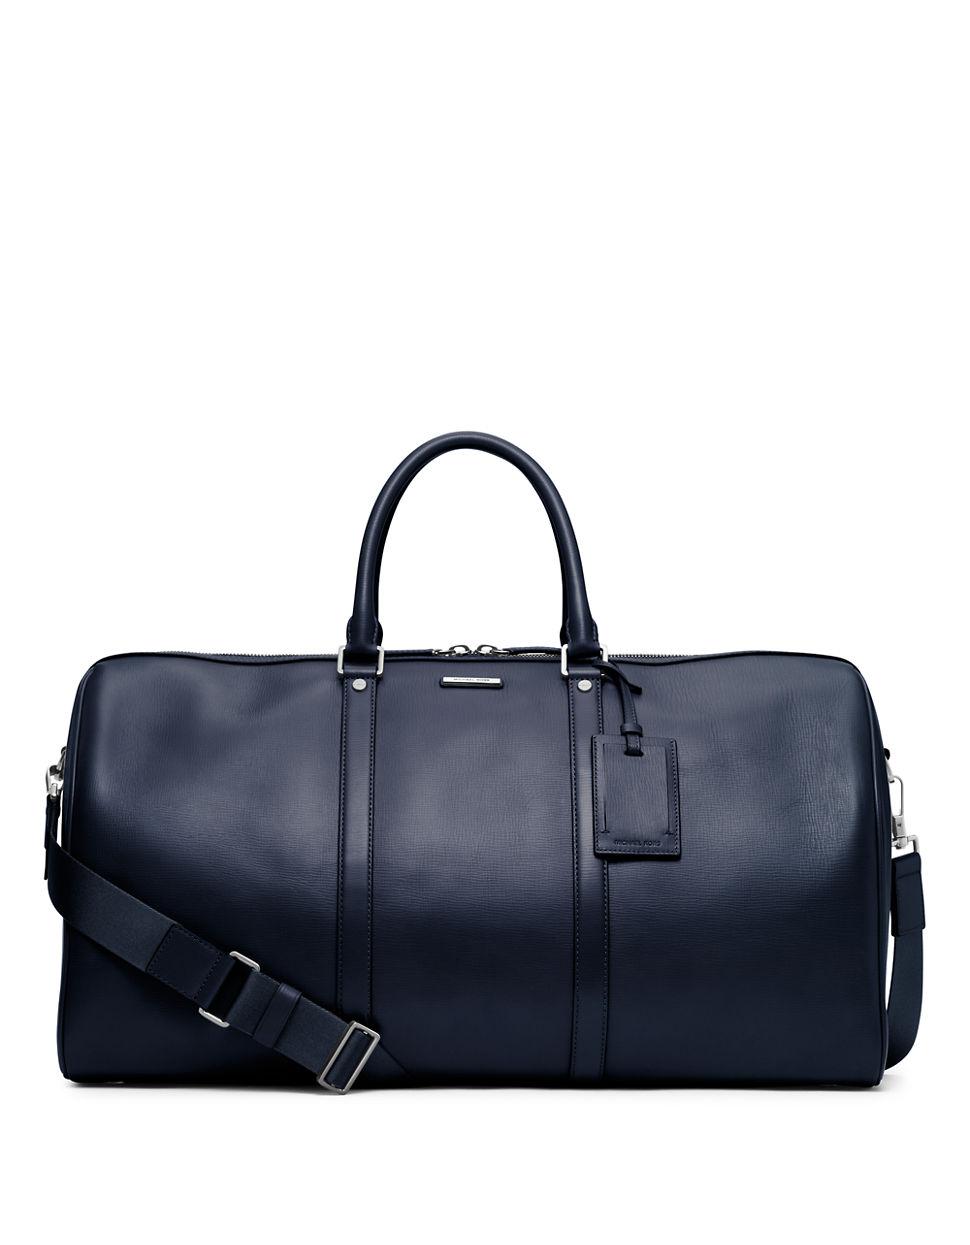 michael kors warren leather travel duffel bag in blue for